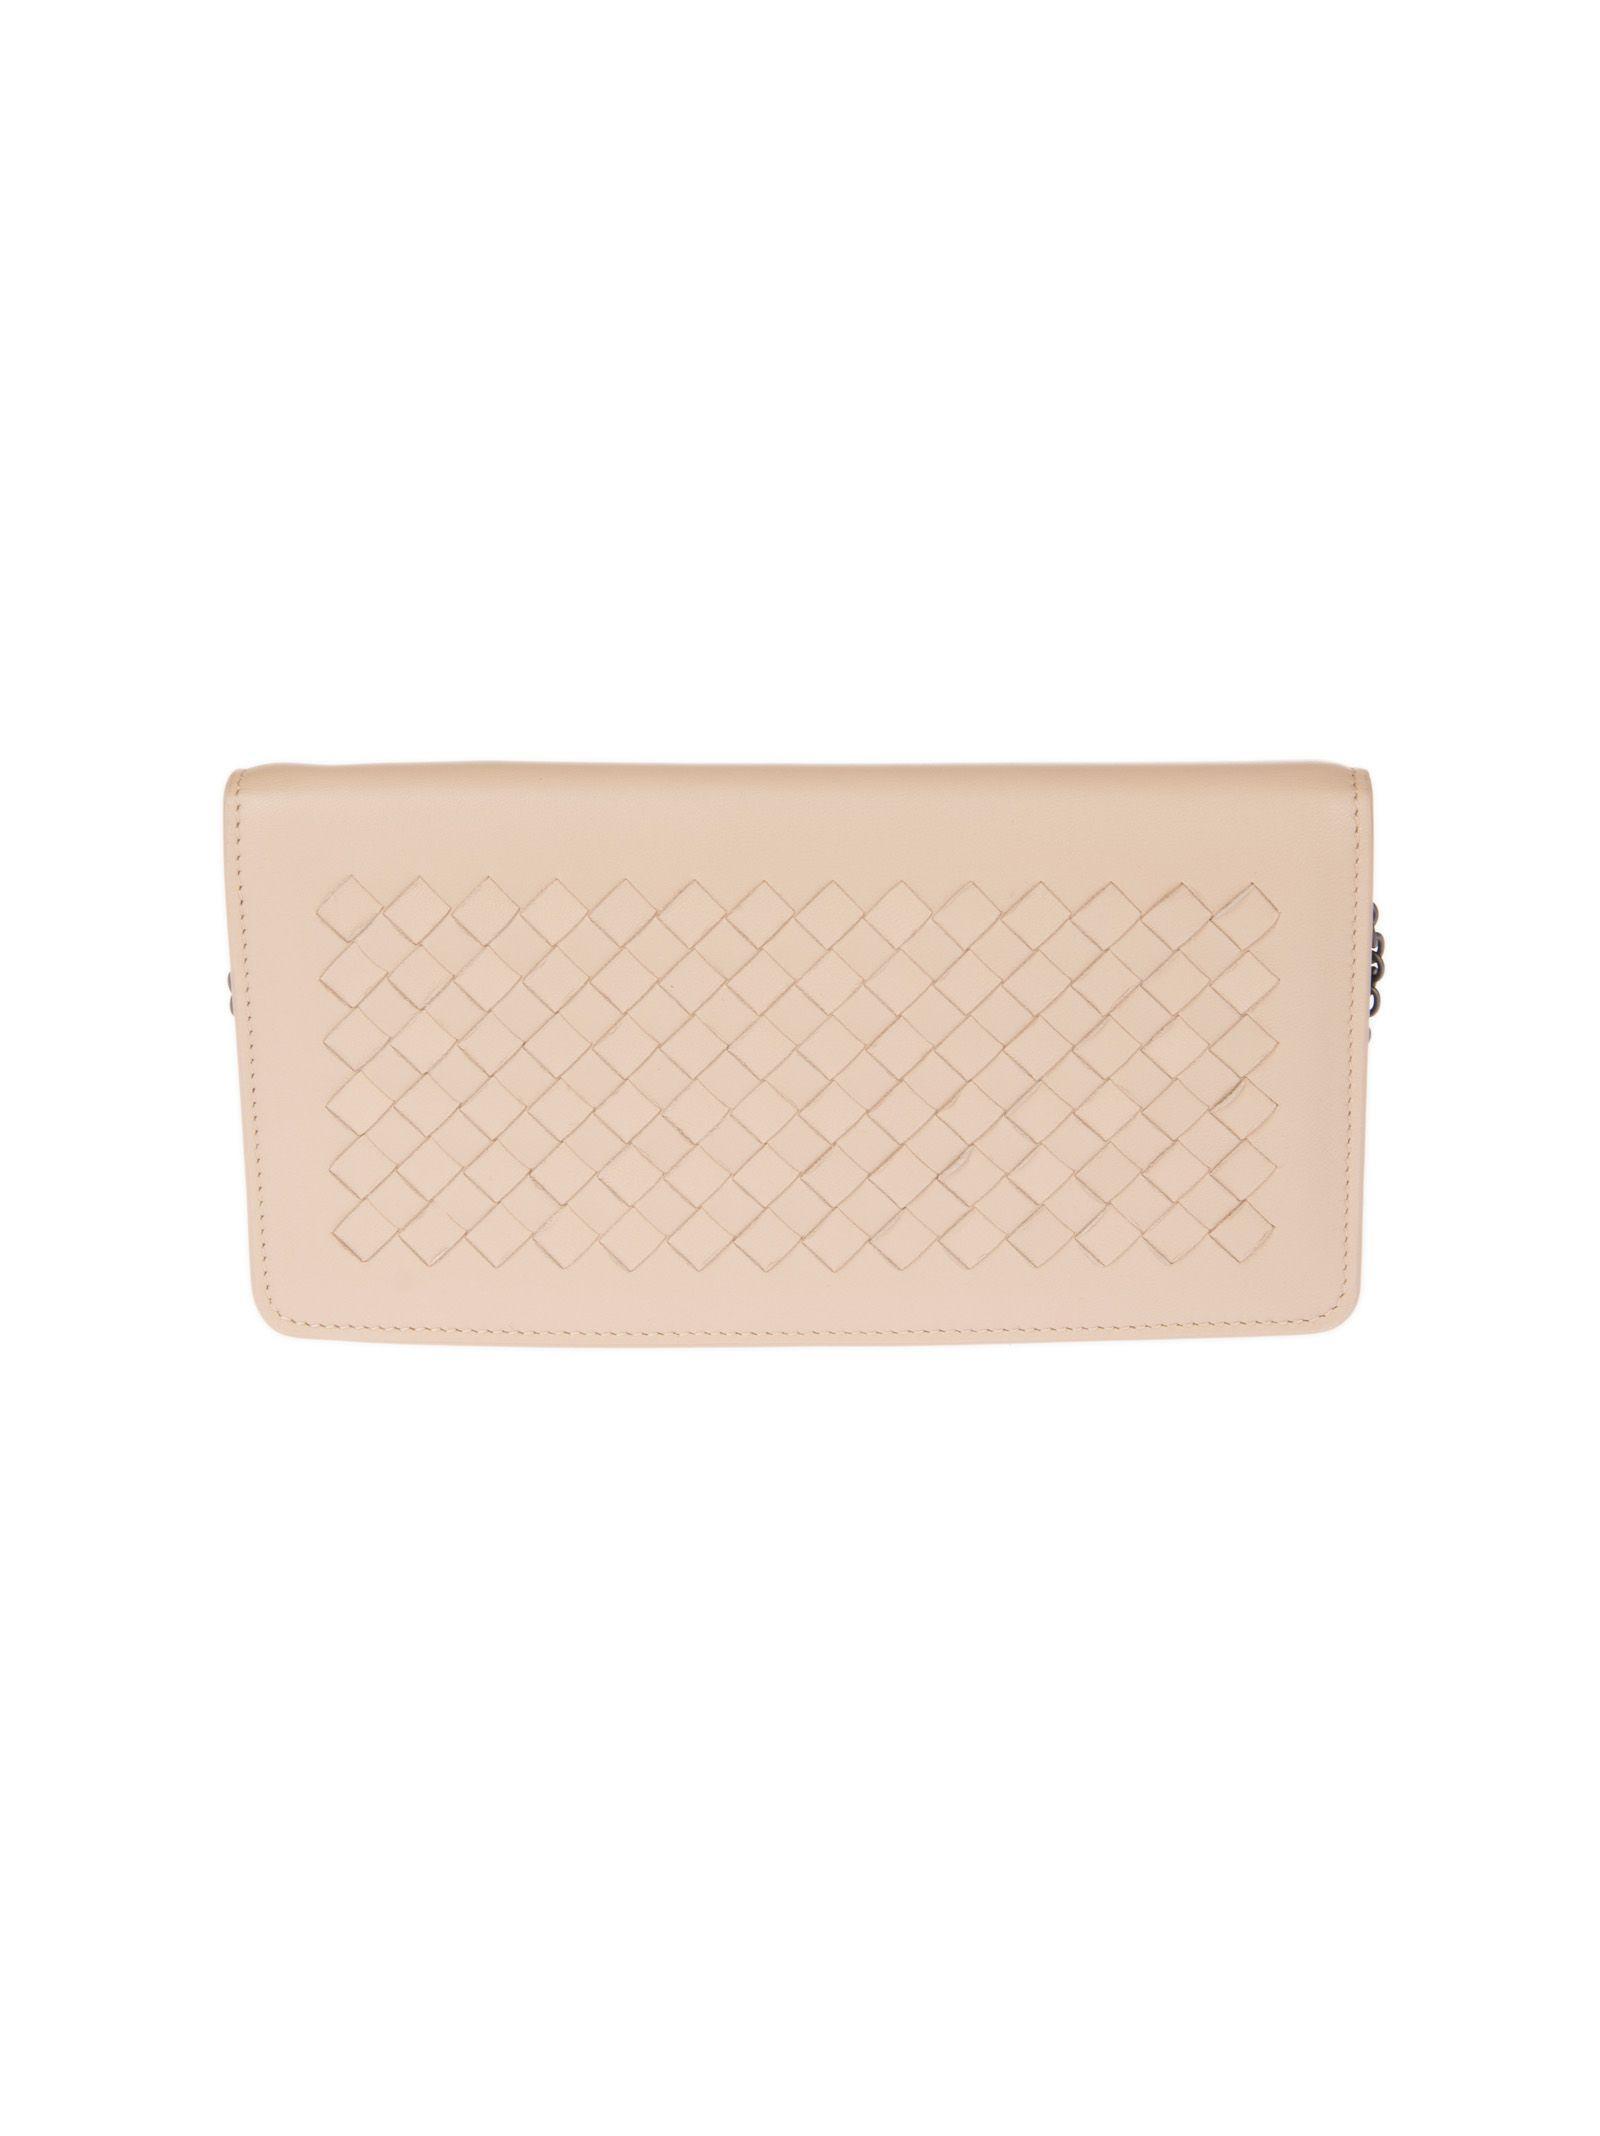 Bottega Veneta Braided Continental Wallet